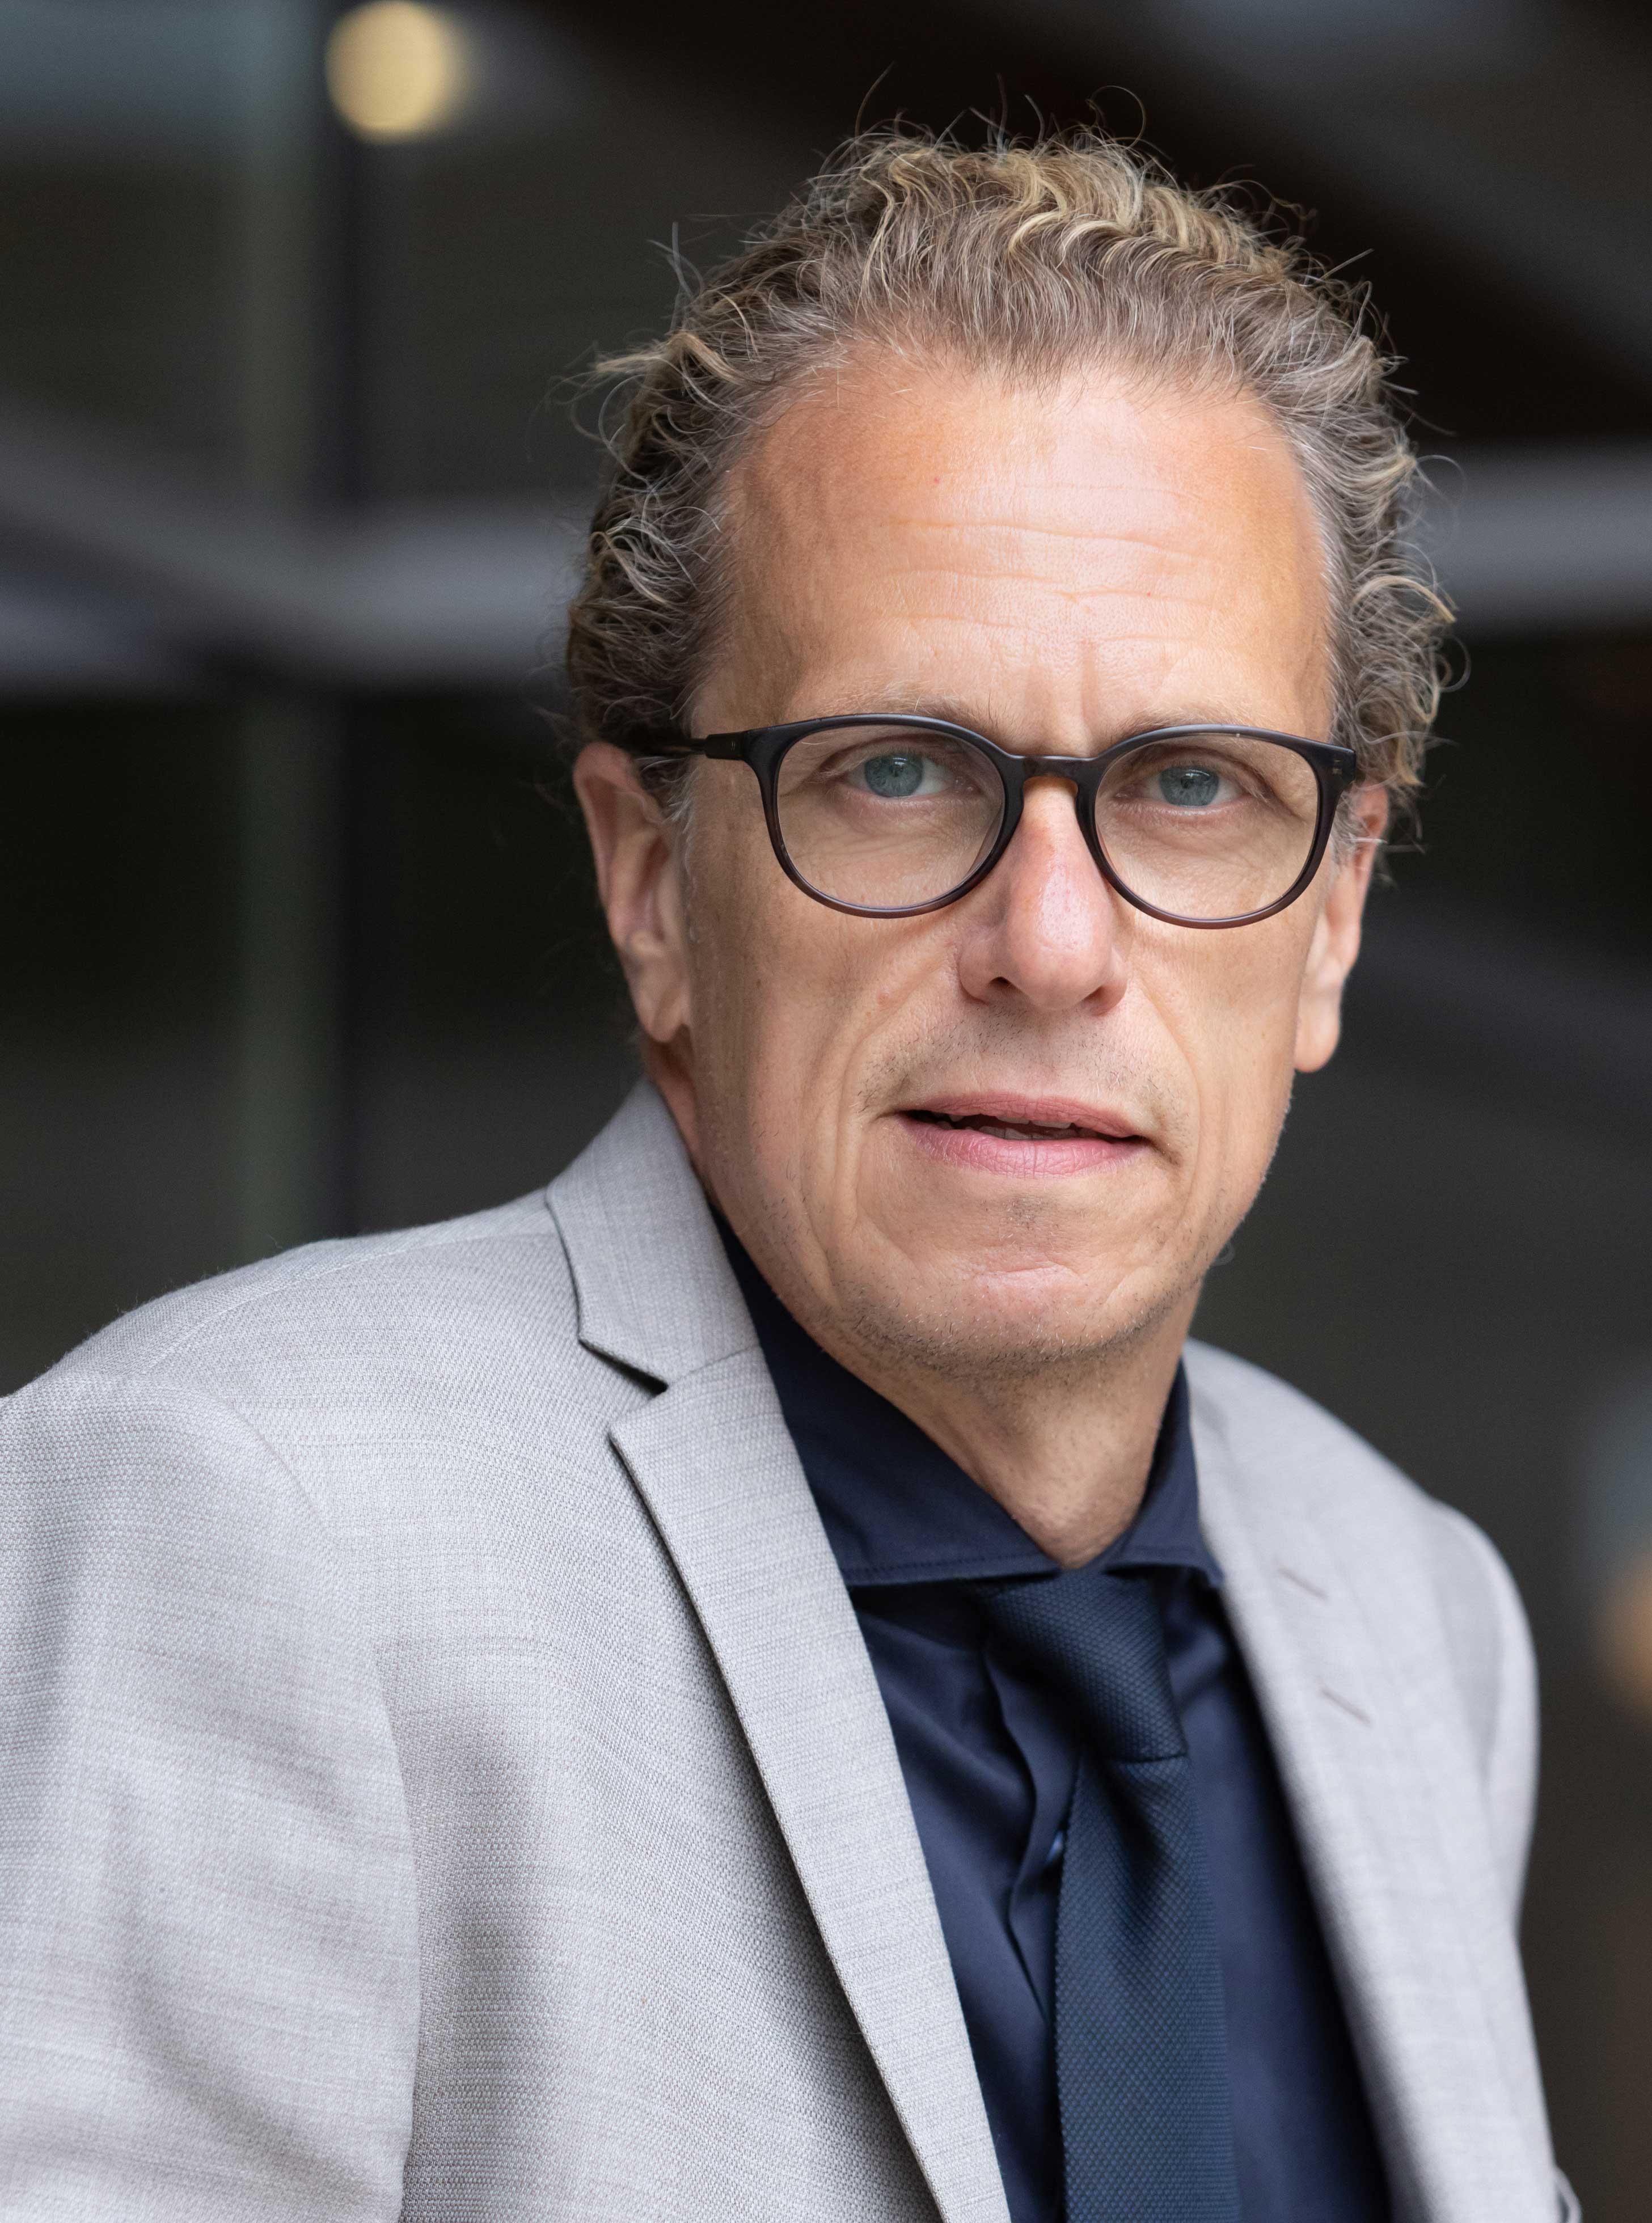 Christian Leuz